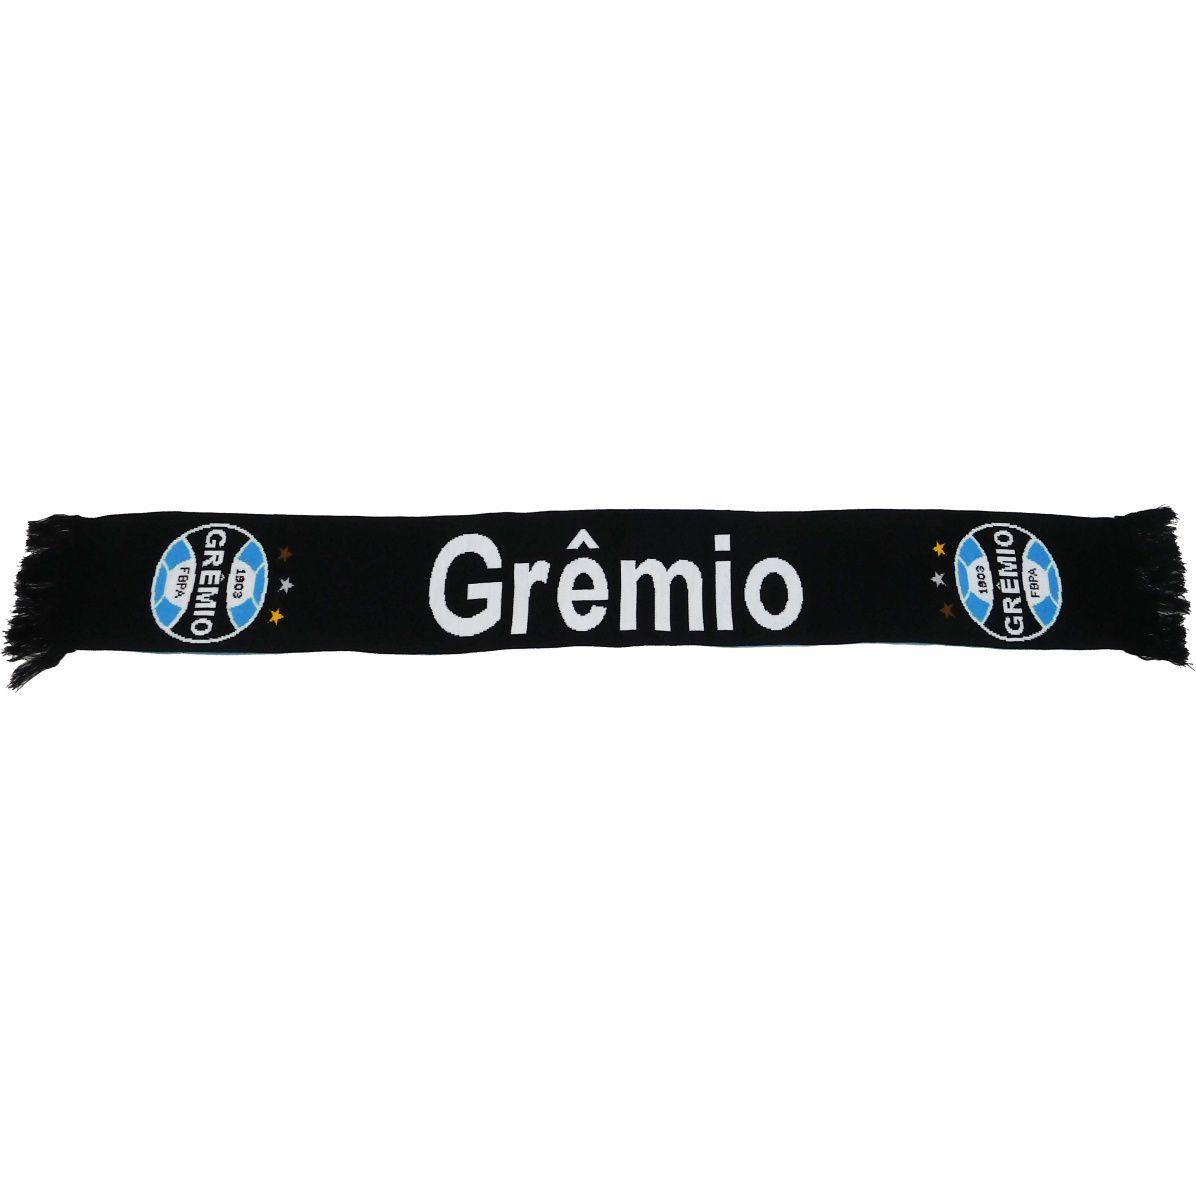 Kit  Cachecol com Gorro Gremio Reversivel Licenciado Oldoni G172 com Brinde